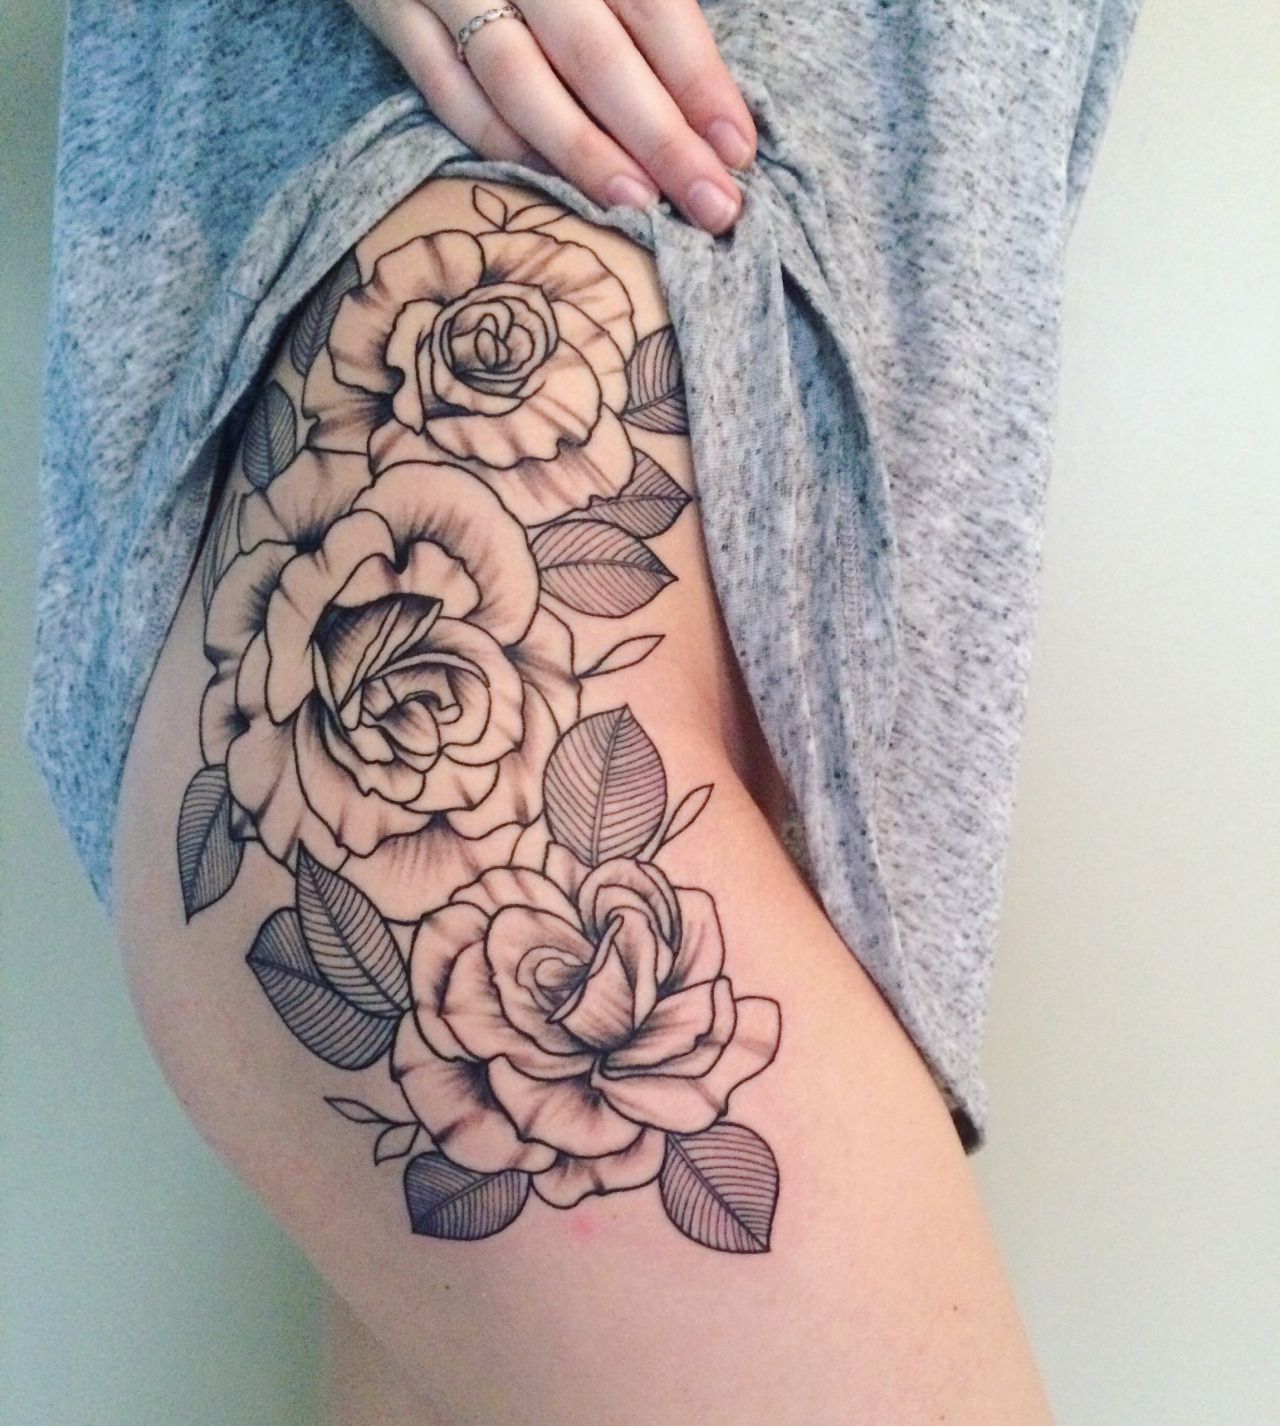 Roses tattoos on hip thigh beauty tatoos pinterest tatoos roses tattoos on hip thigh izmirmasajfo